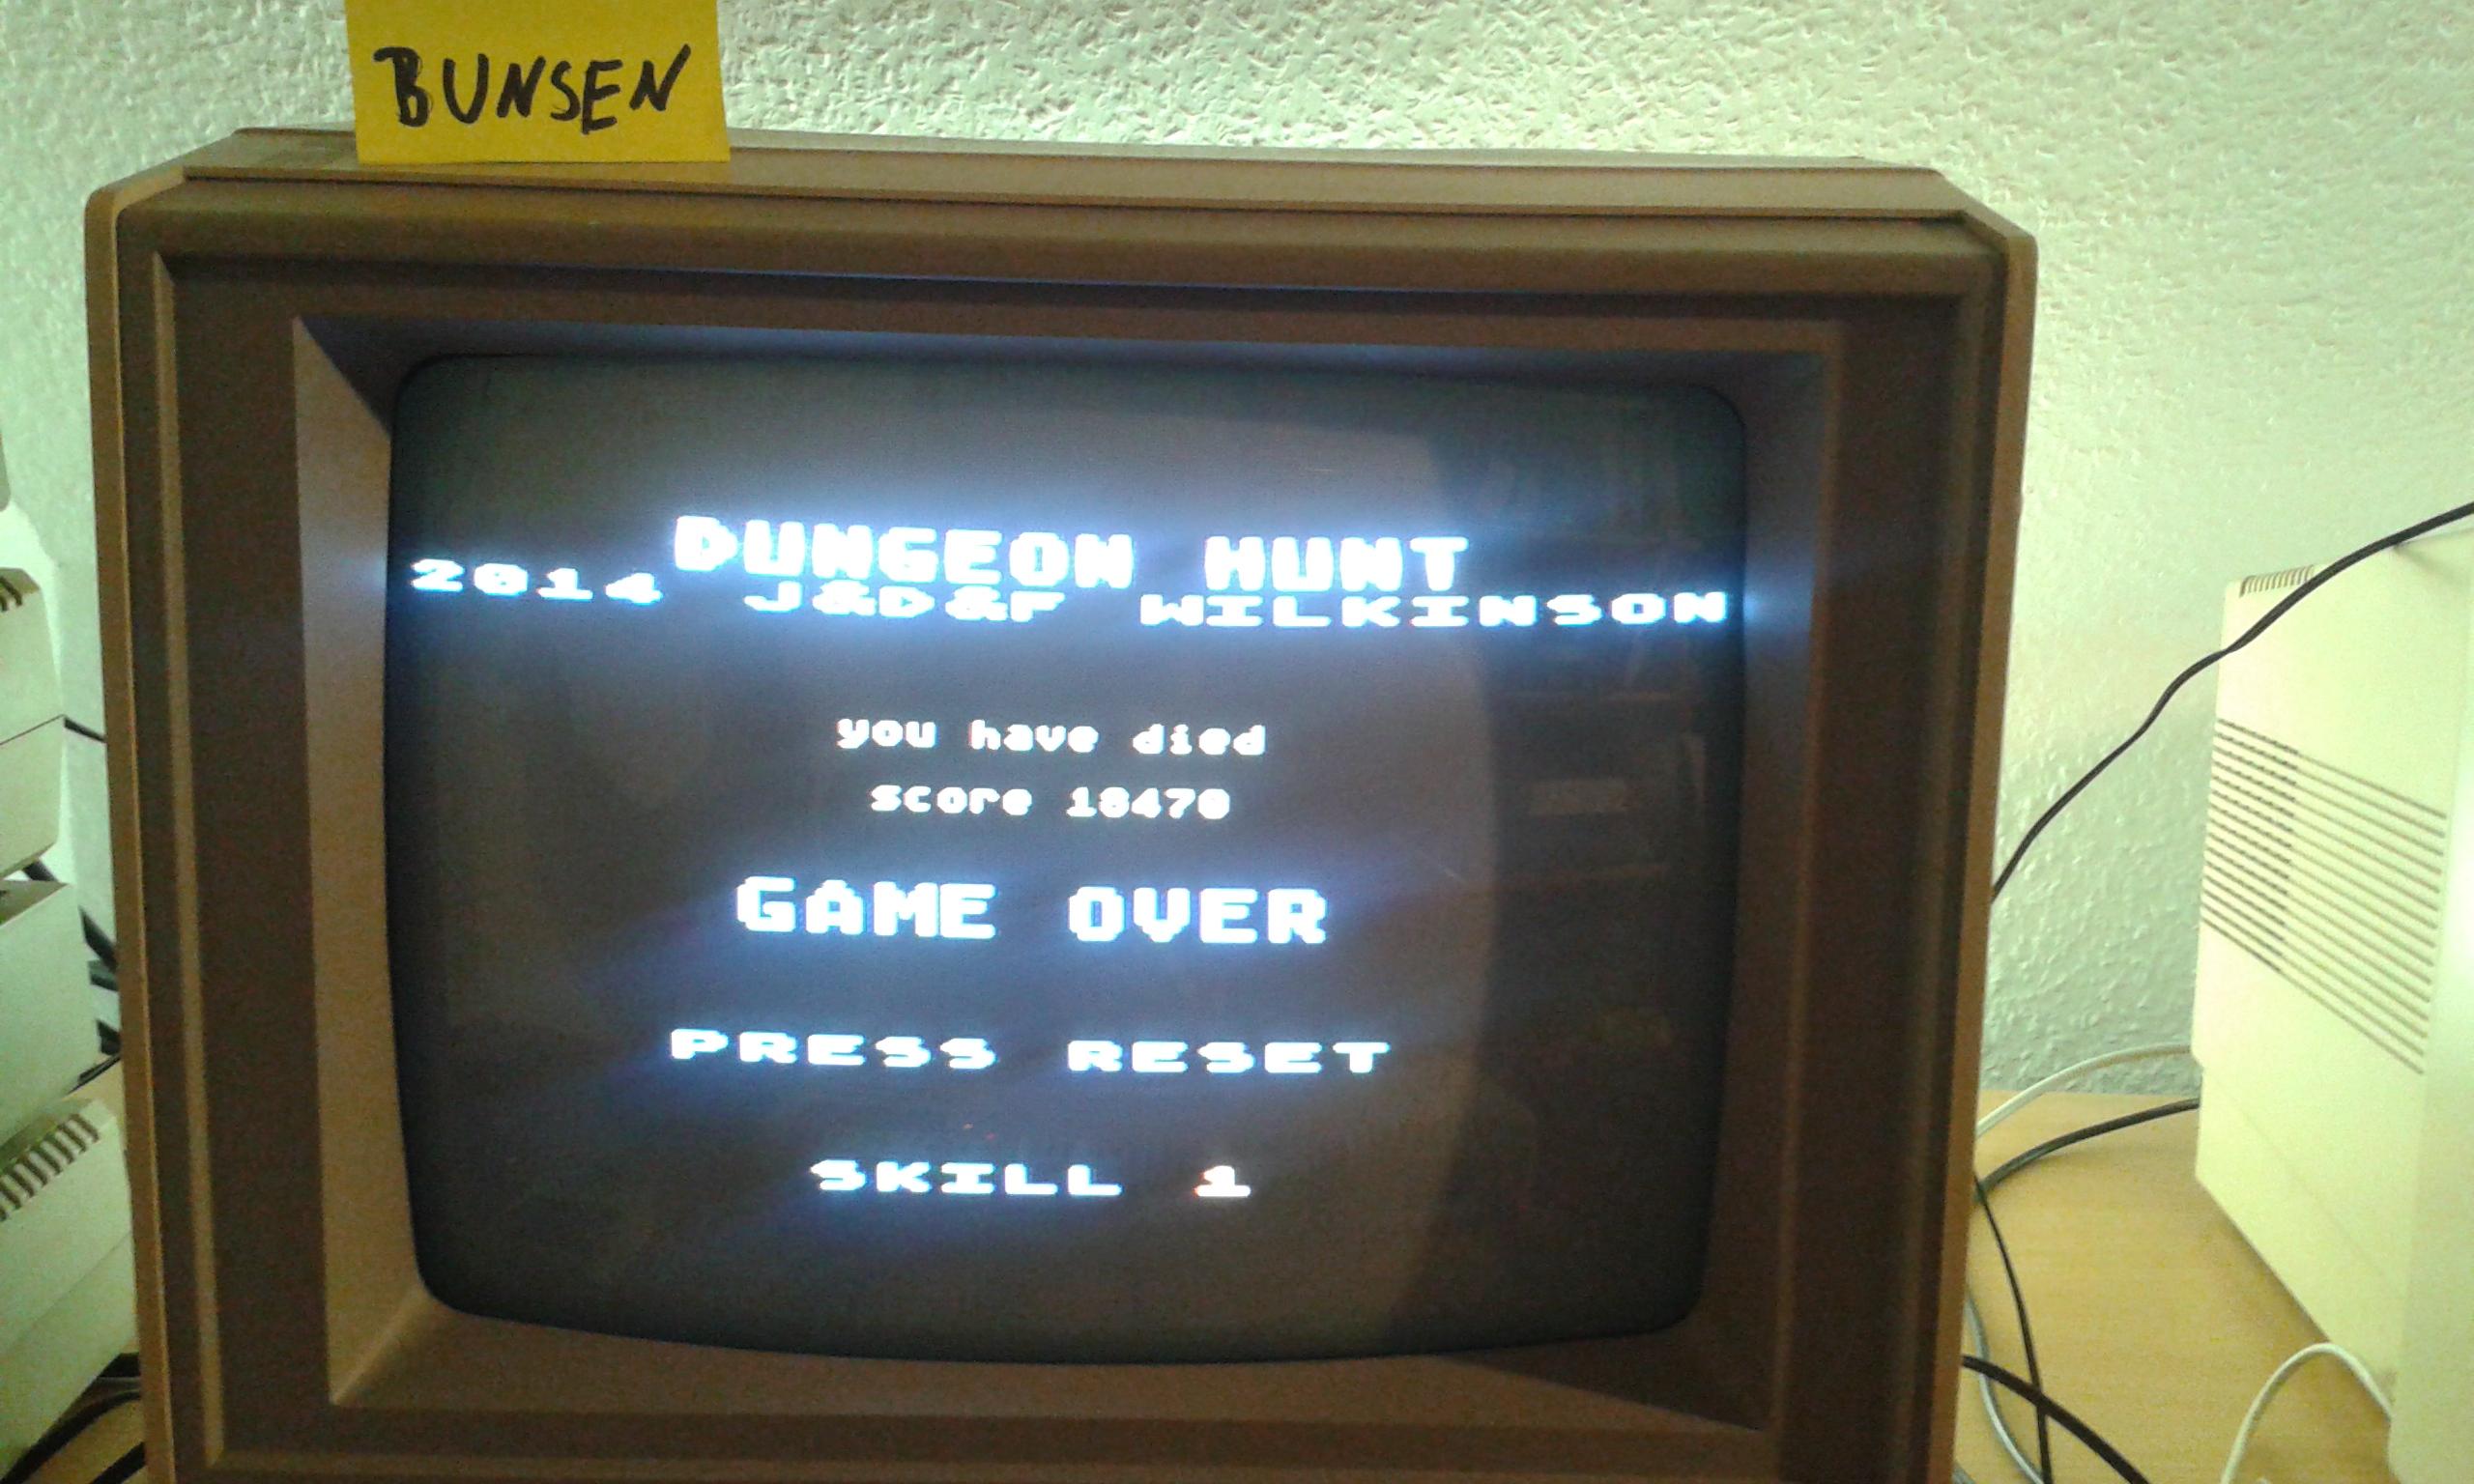 Bunsen: Dungeon Hunt (Atari 400/800/XL/XE) 18,470 points on 2015-02-19 13:40:34